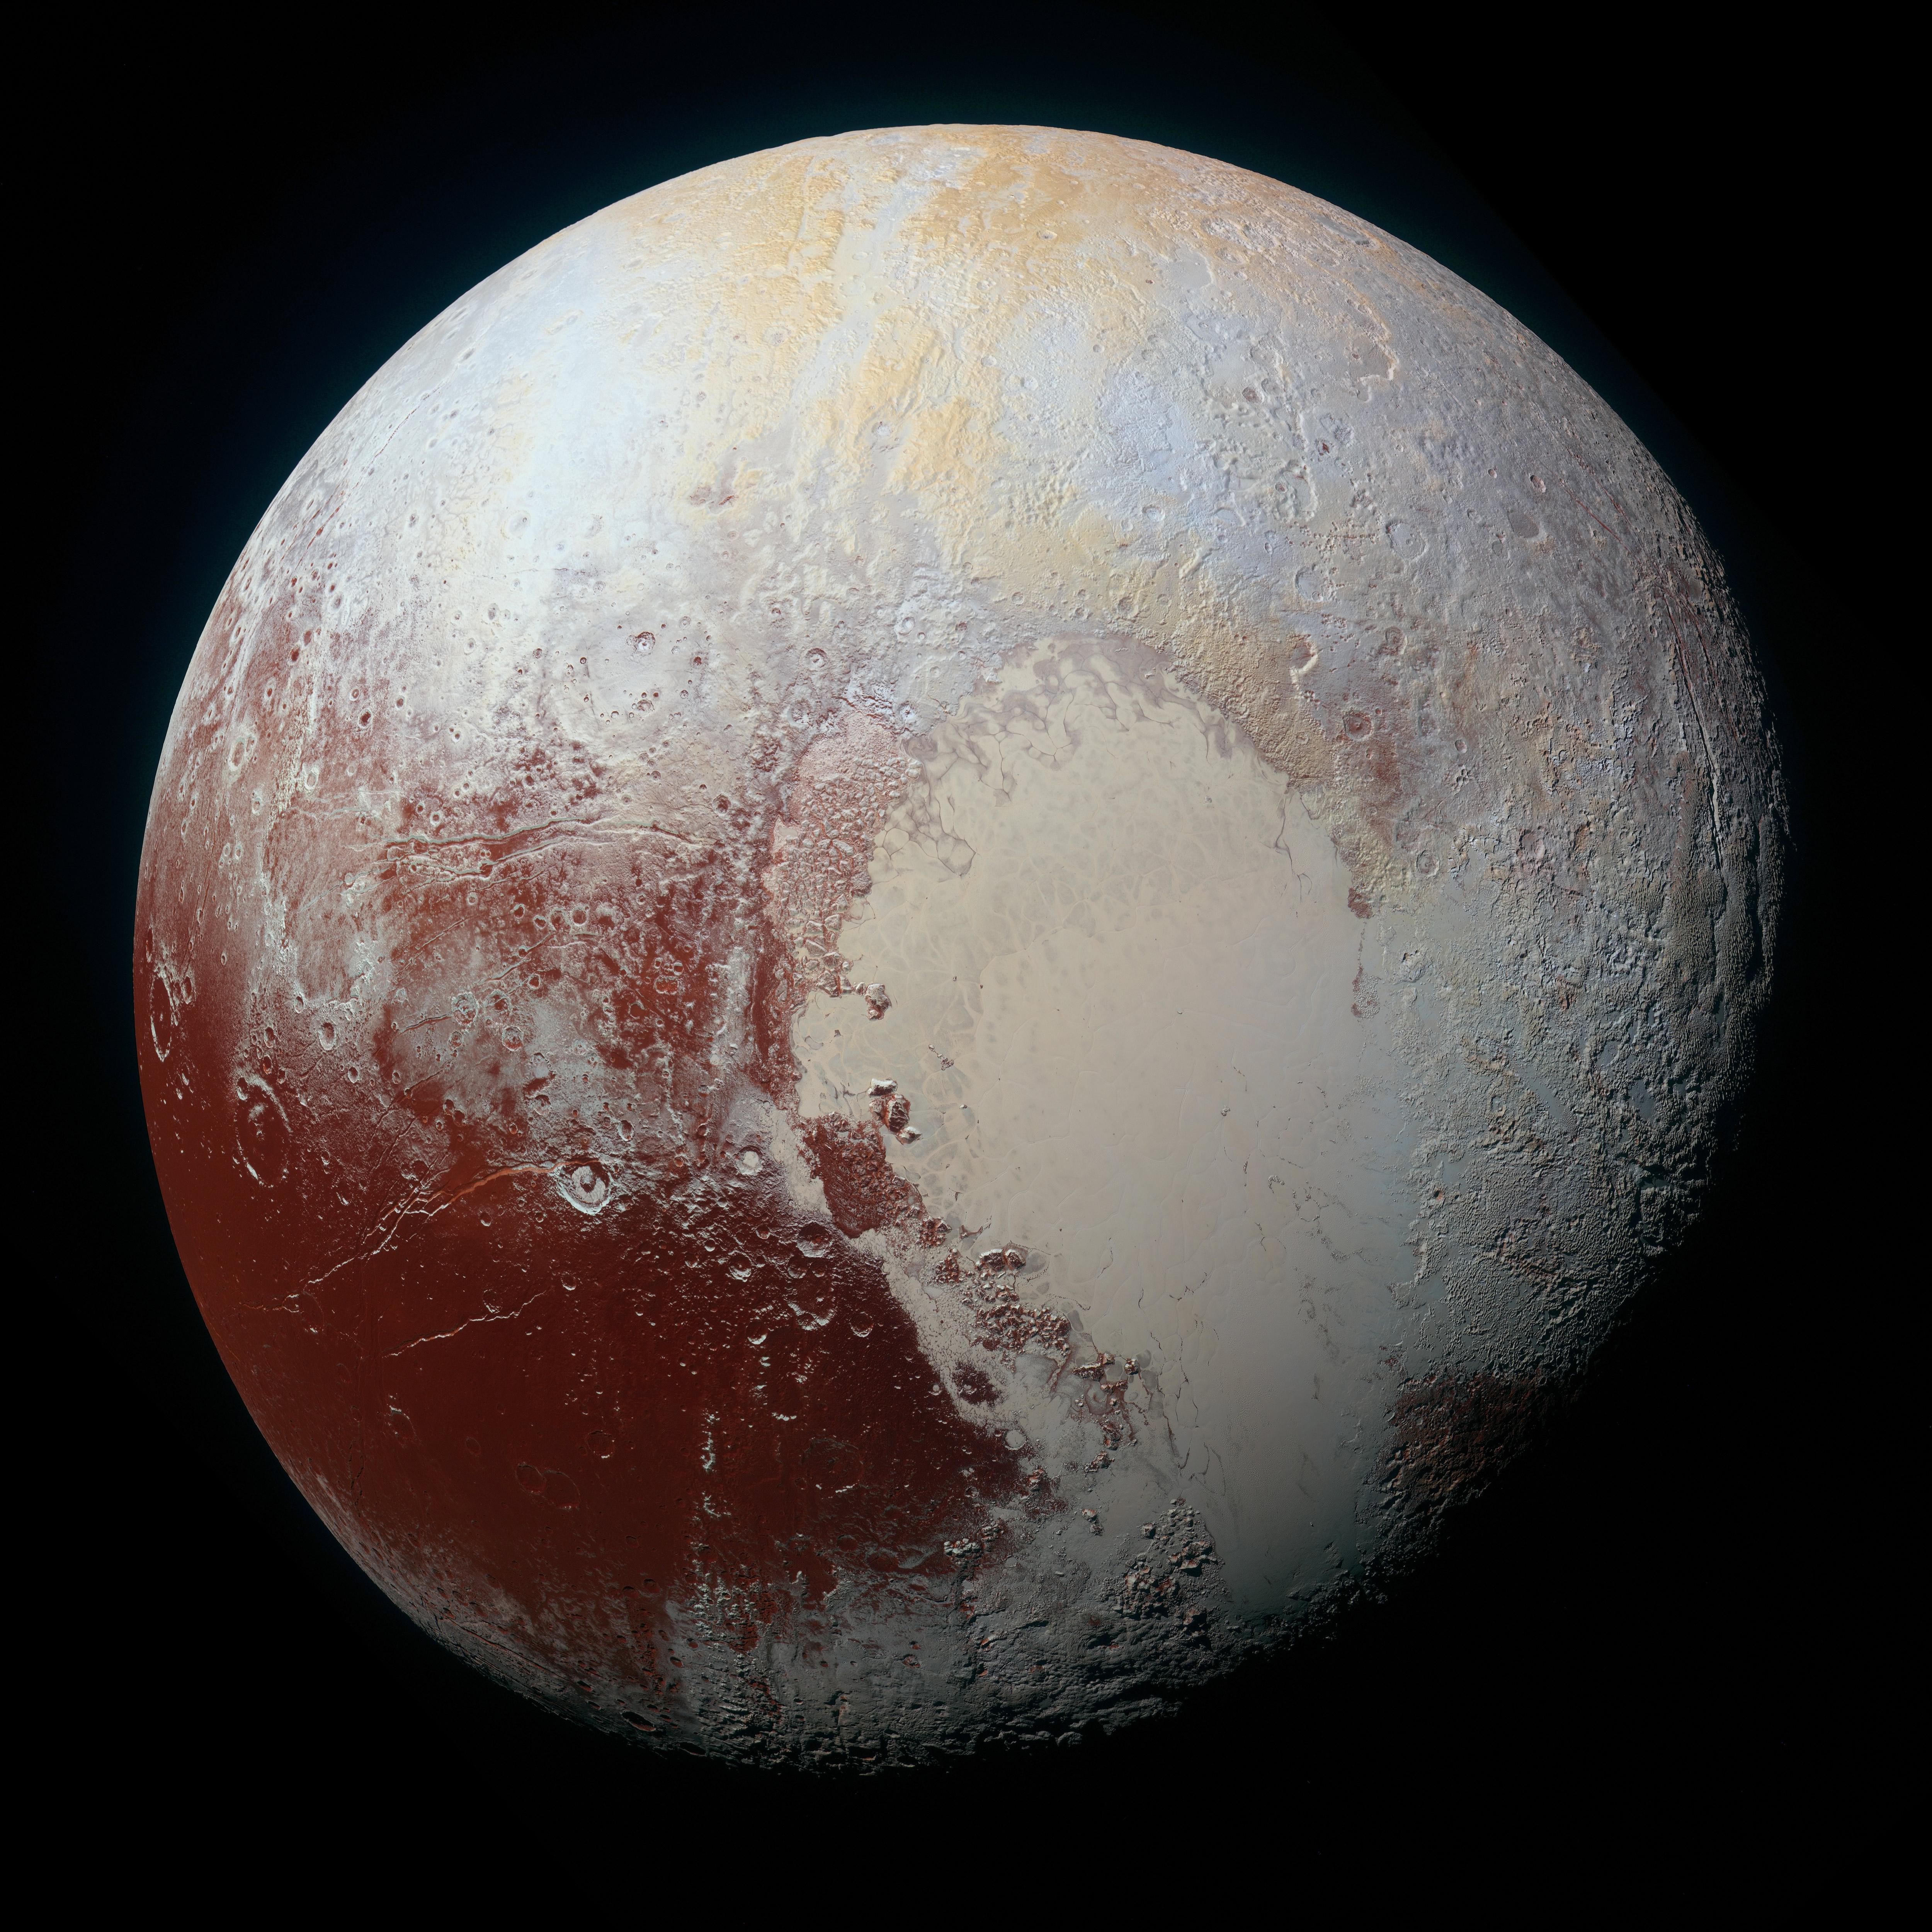 Plutone a colori! Fonte: NASA/JHUAPL/SwRI